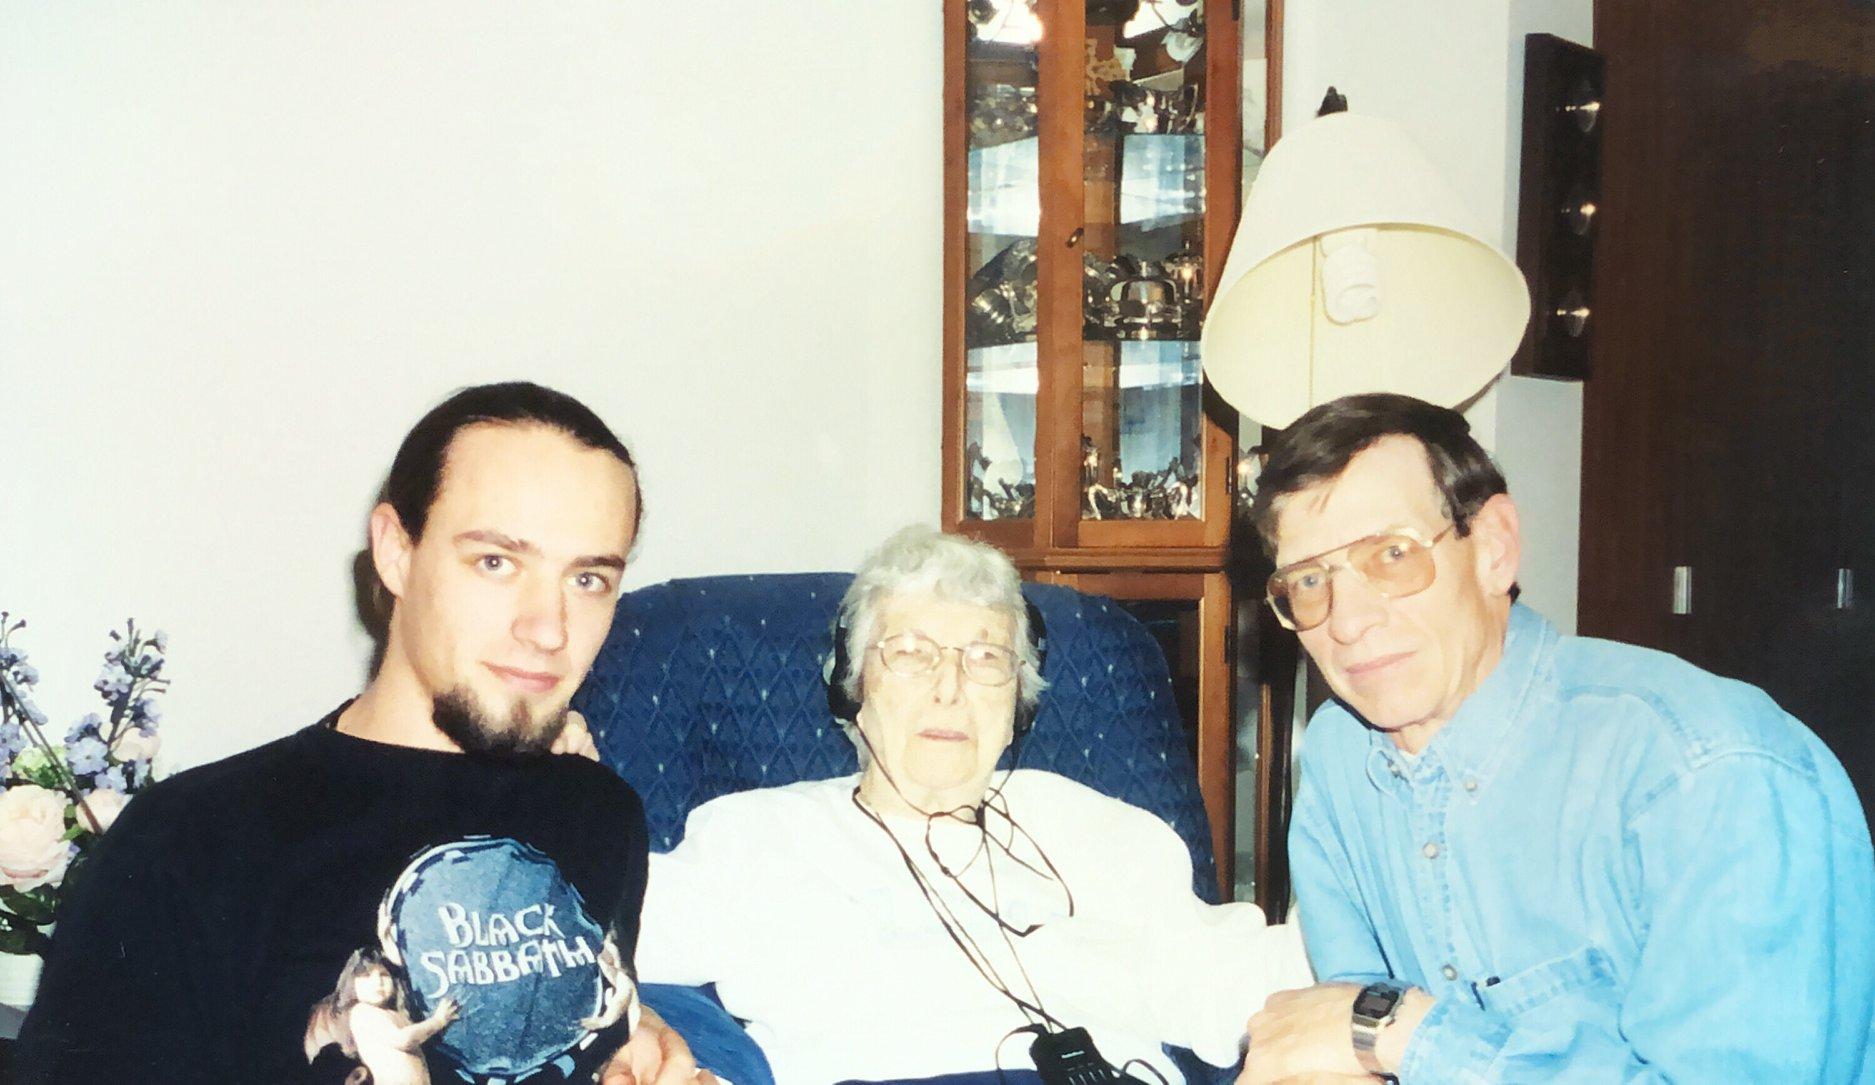 Thaddeus, Geraldine Koster, and John